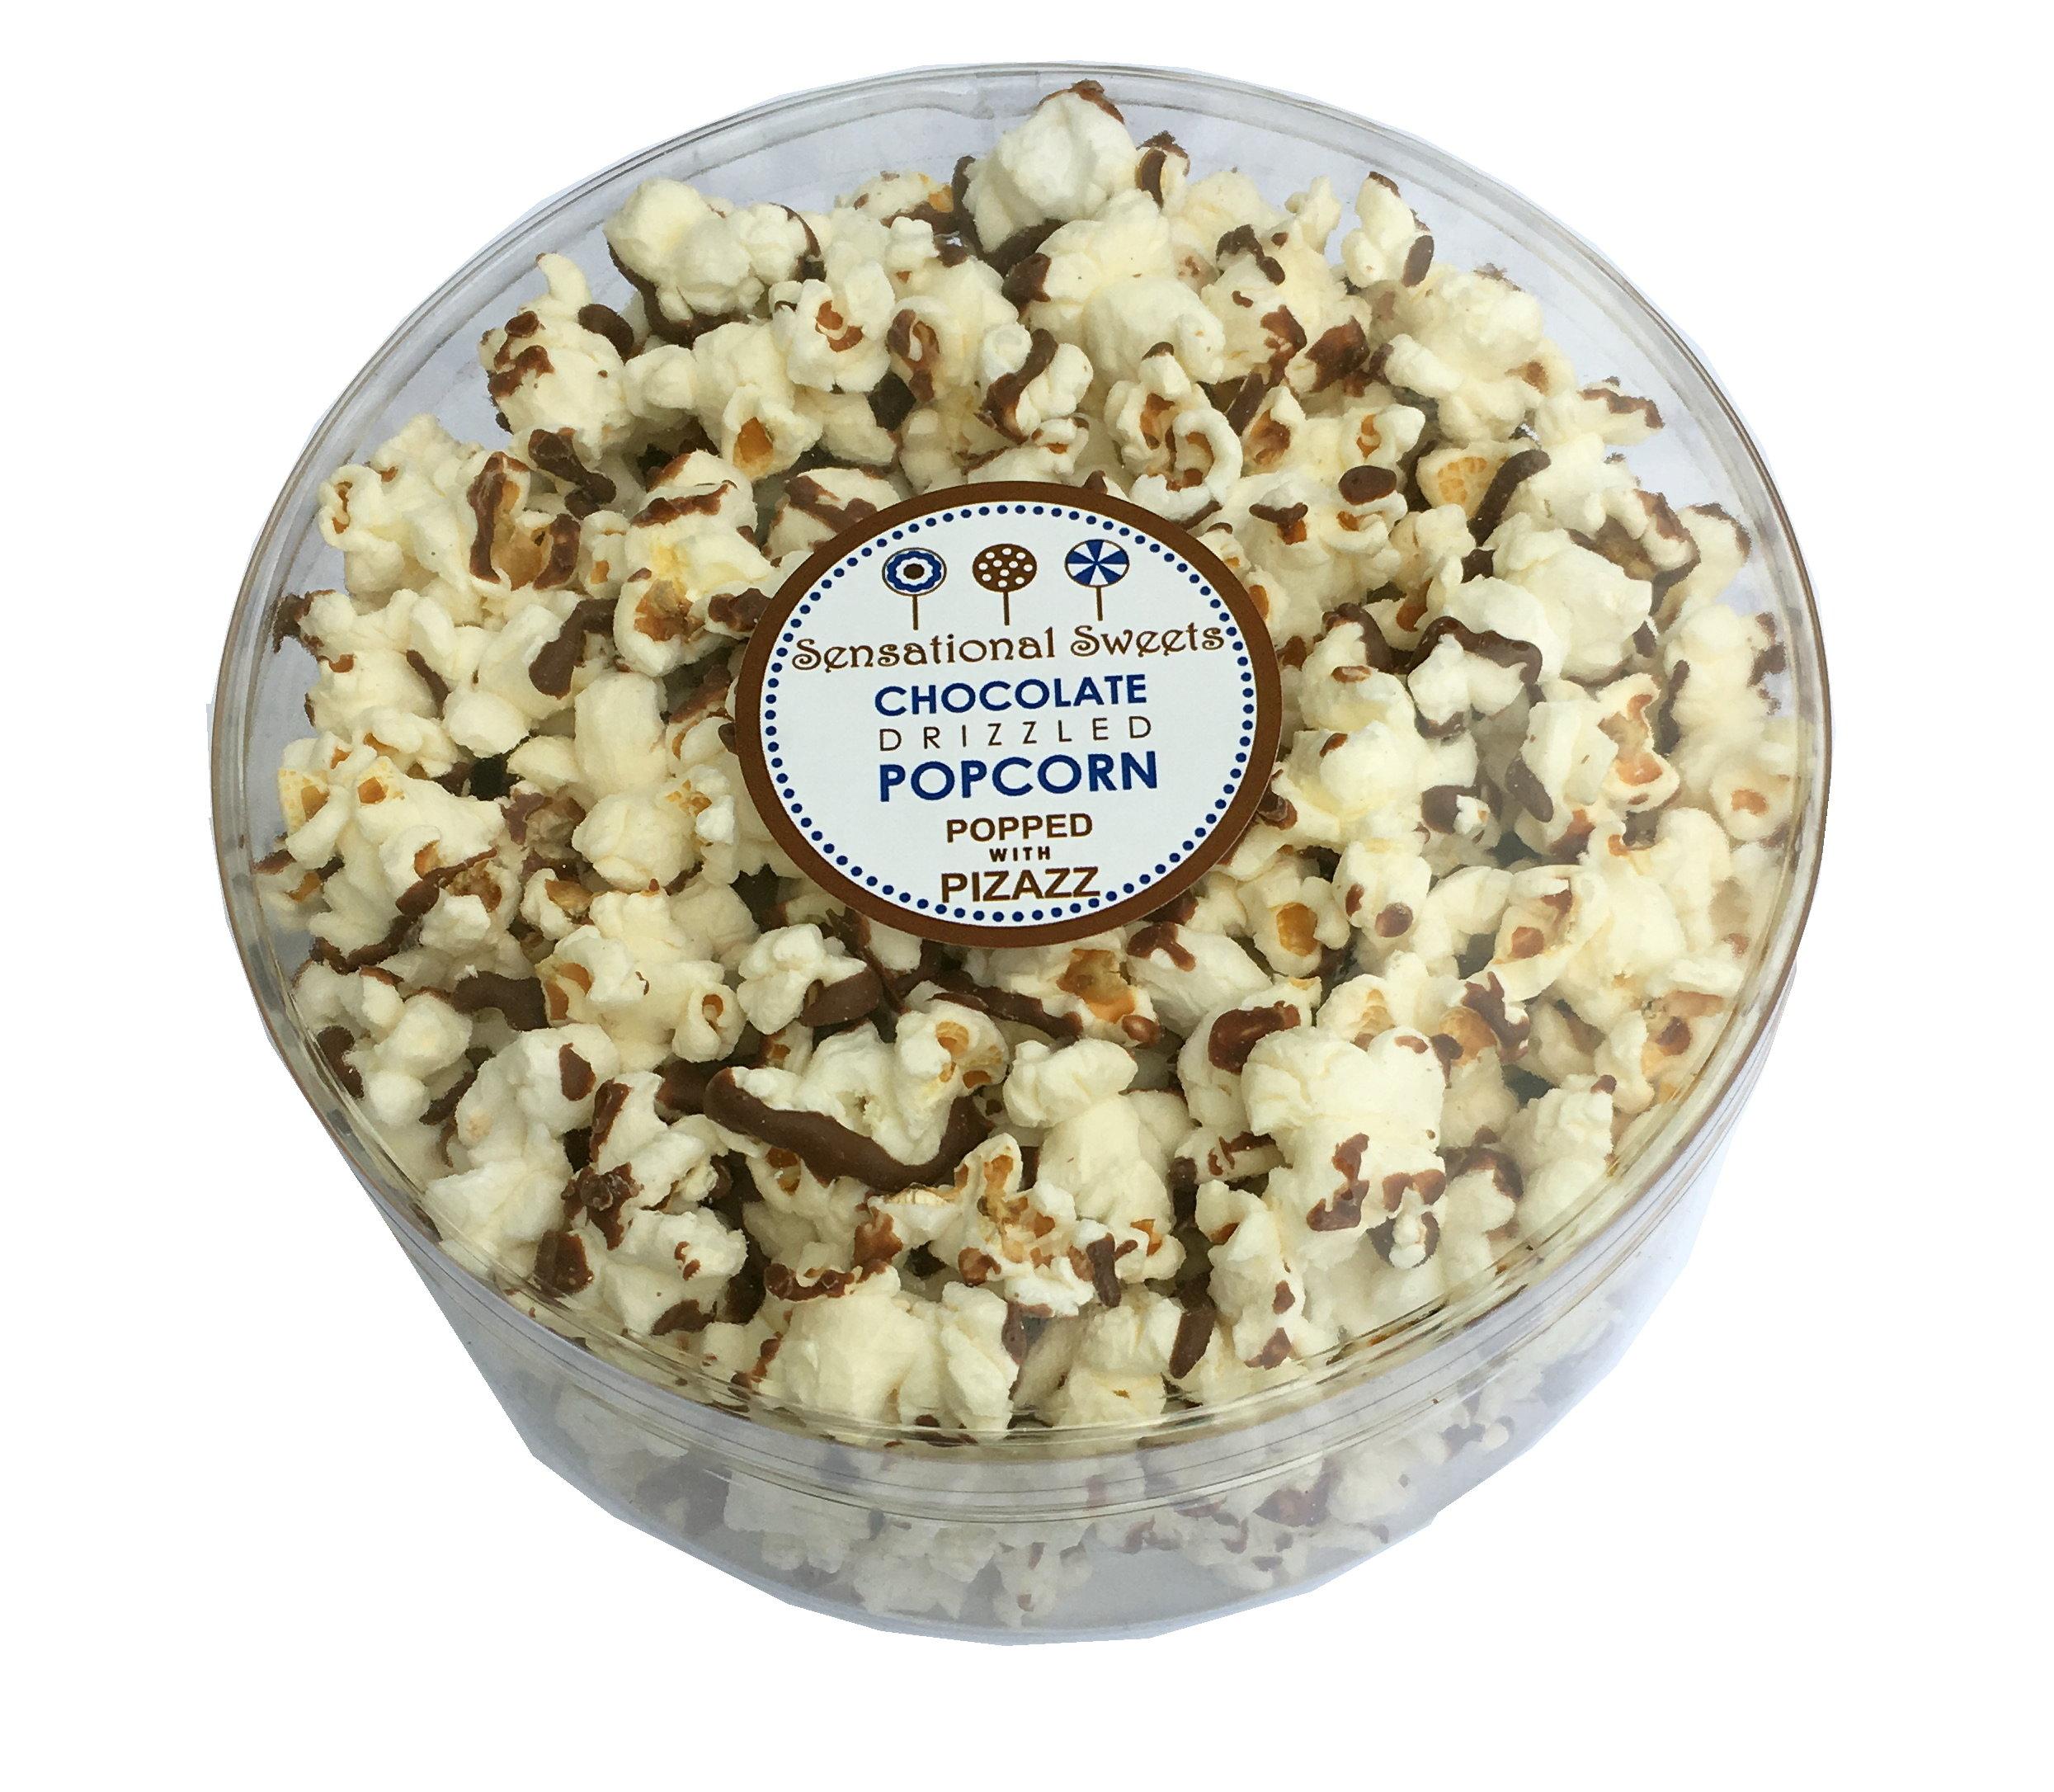 Gourmet Chocolate Drizzle Popcorn - 3 oz. Small Tub - Wholesale W-PCDLX